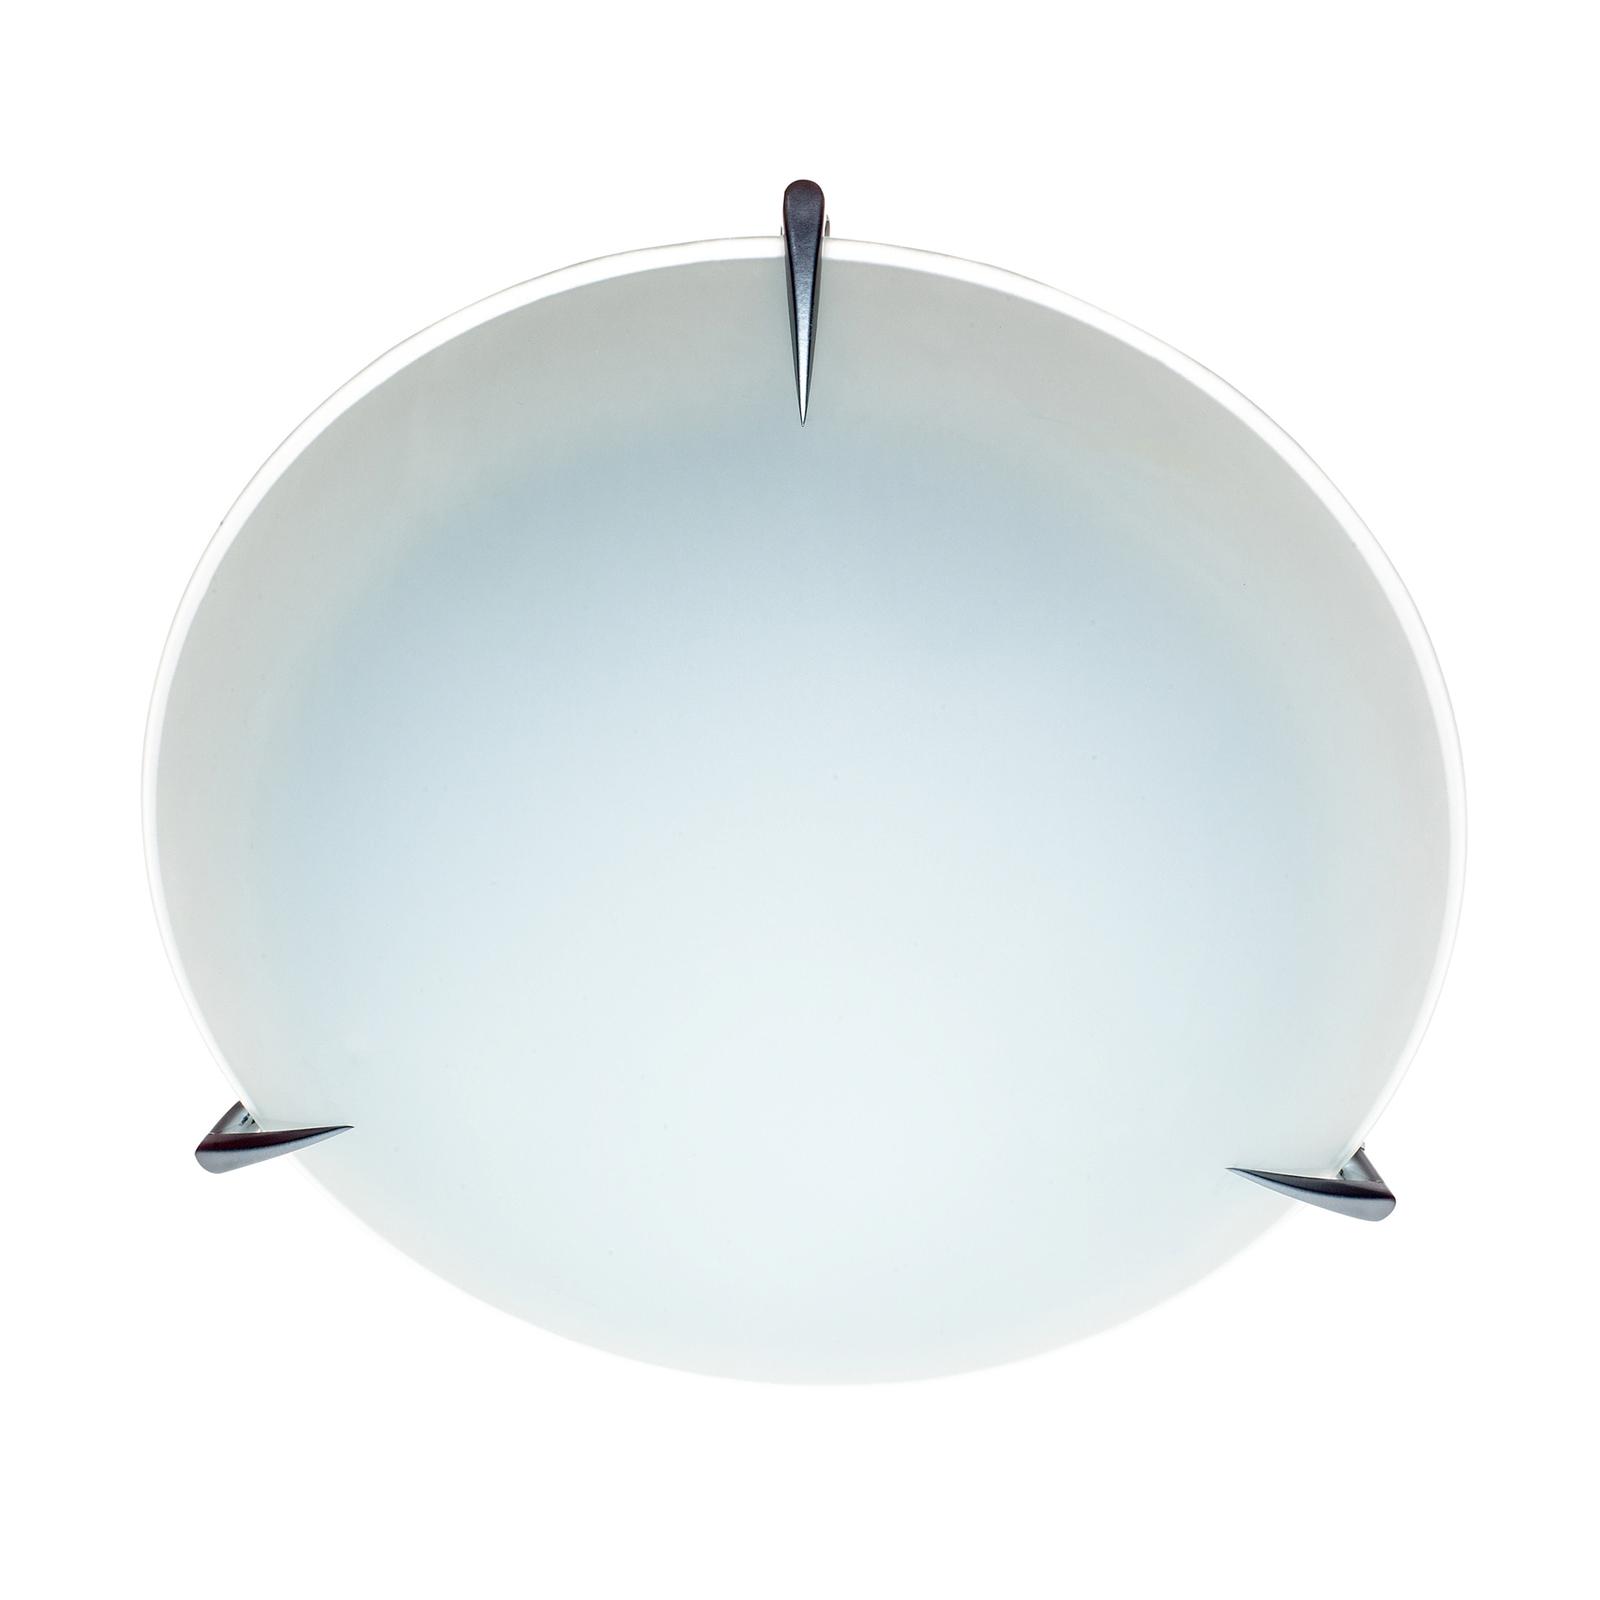 Kattovalaisin Mars lasista, Ø 25 cm